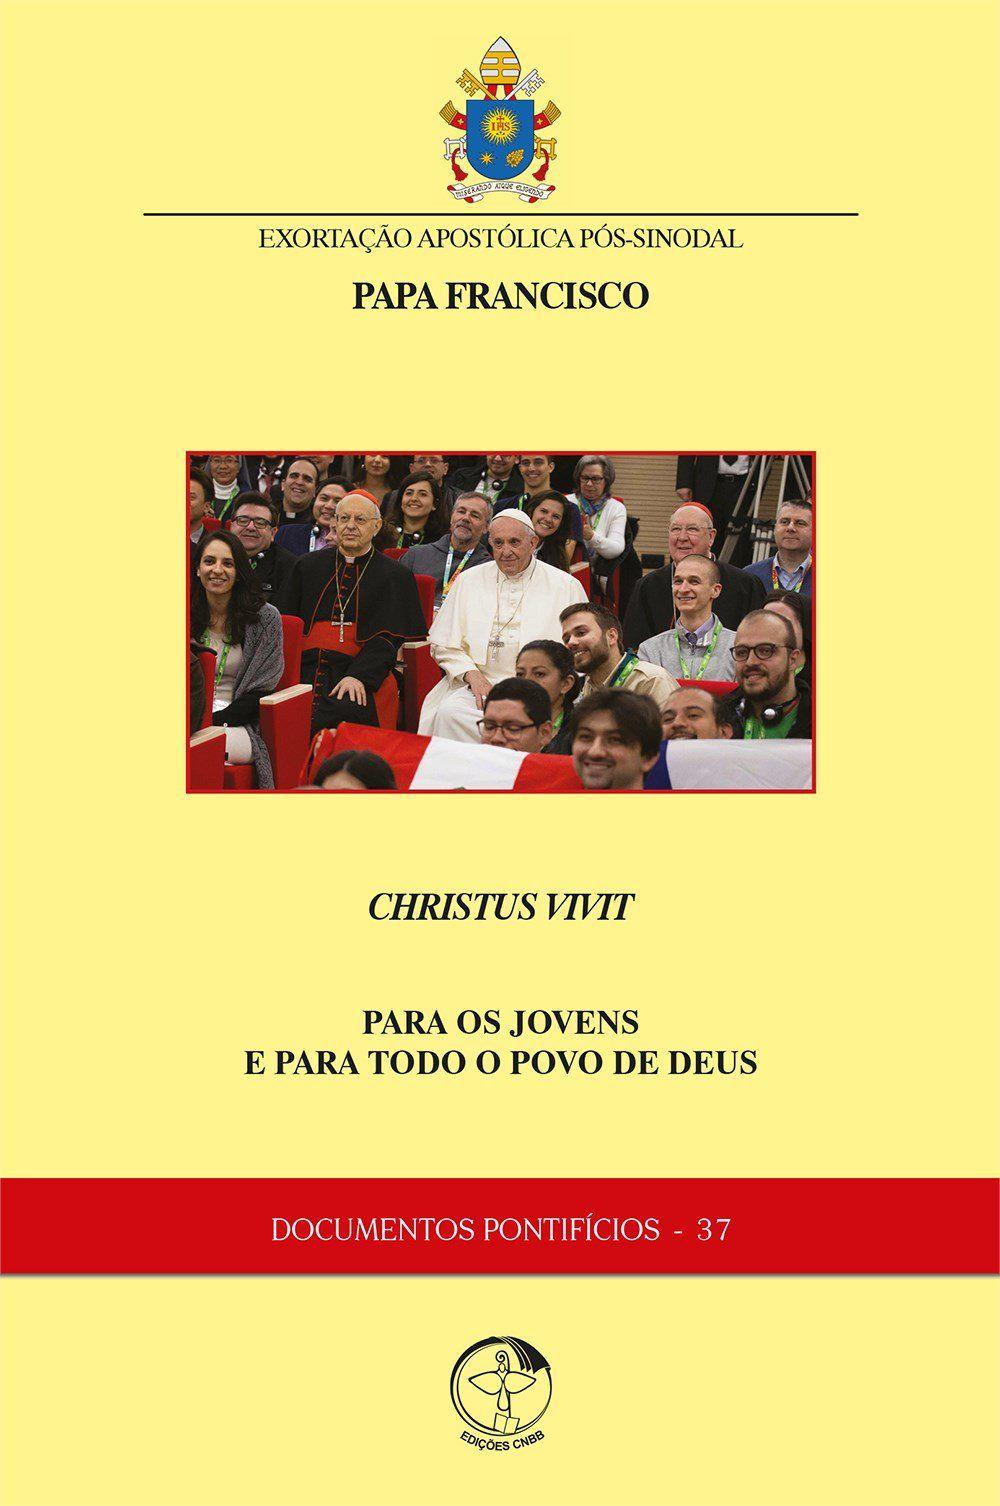 Exortação Apostólica Pós-Sinodal CHRISTUS VIVIT - Documentos Pontifícios 37  - Pastoral Familiar CNBB